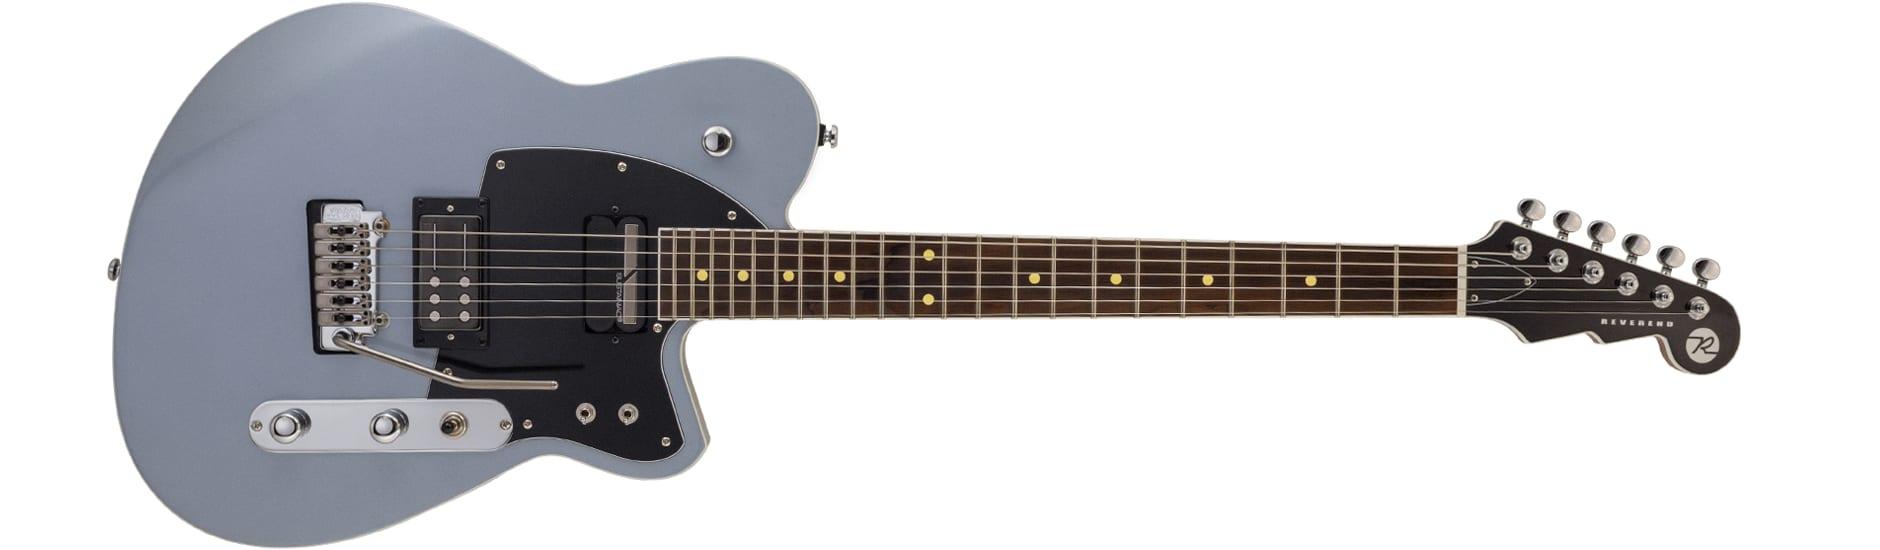 Reverend Guitars new Reeves Gabrels 'sustainer' signature model